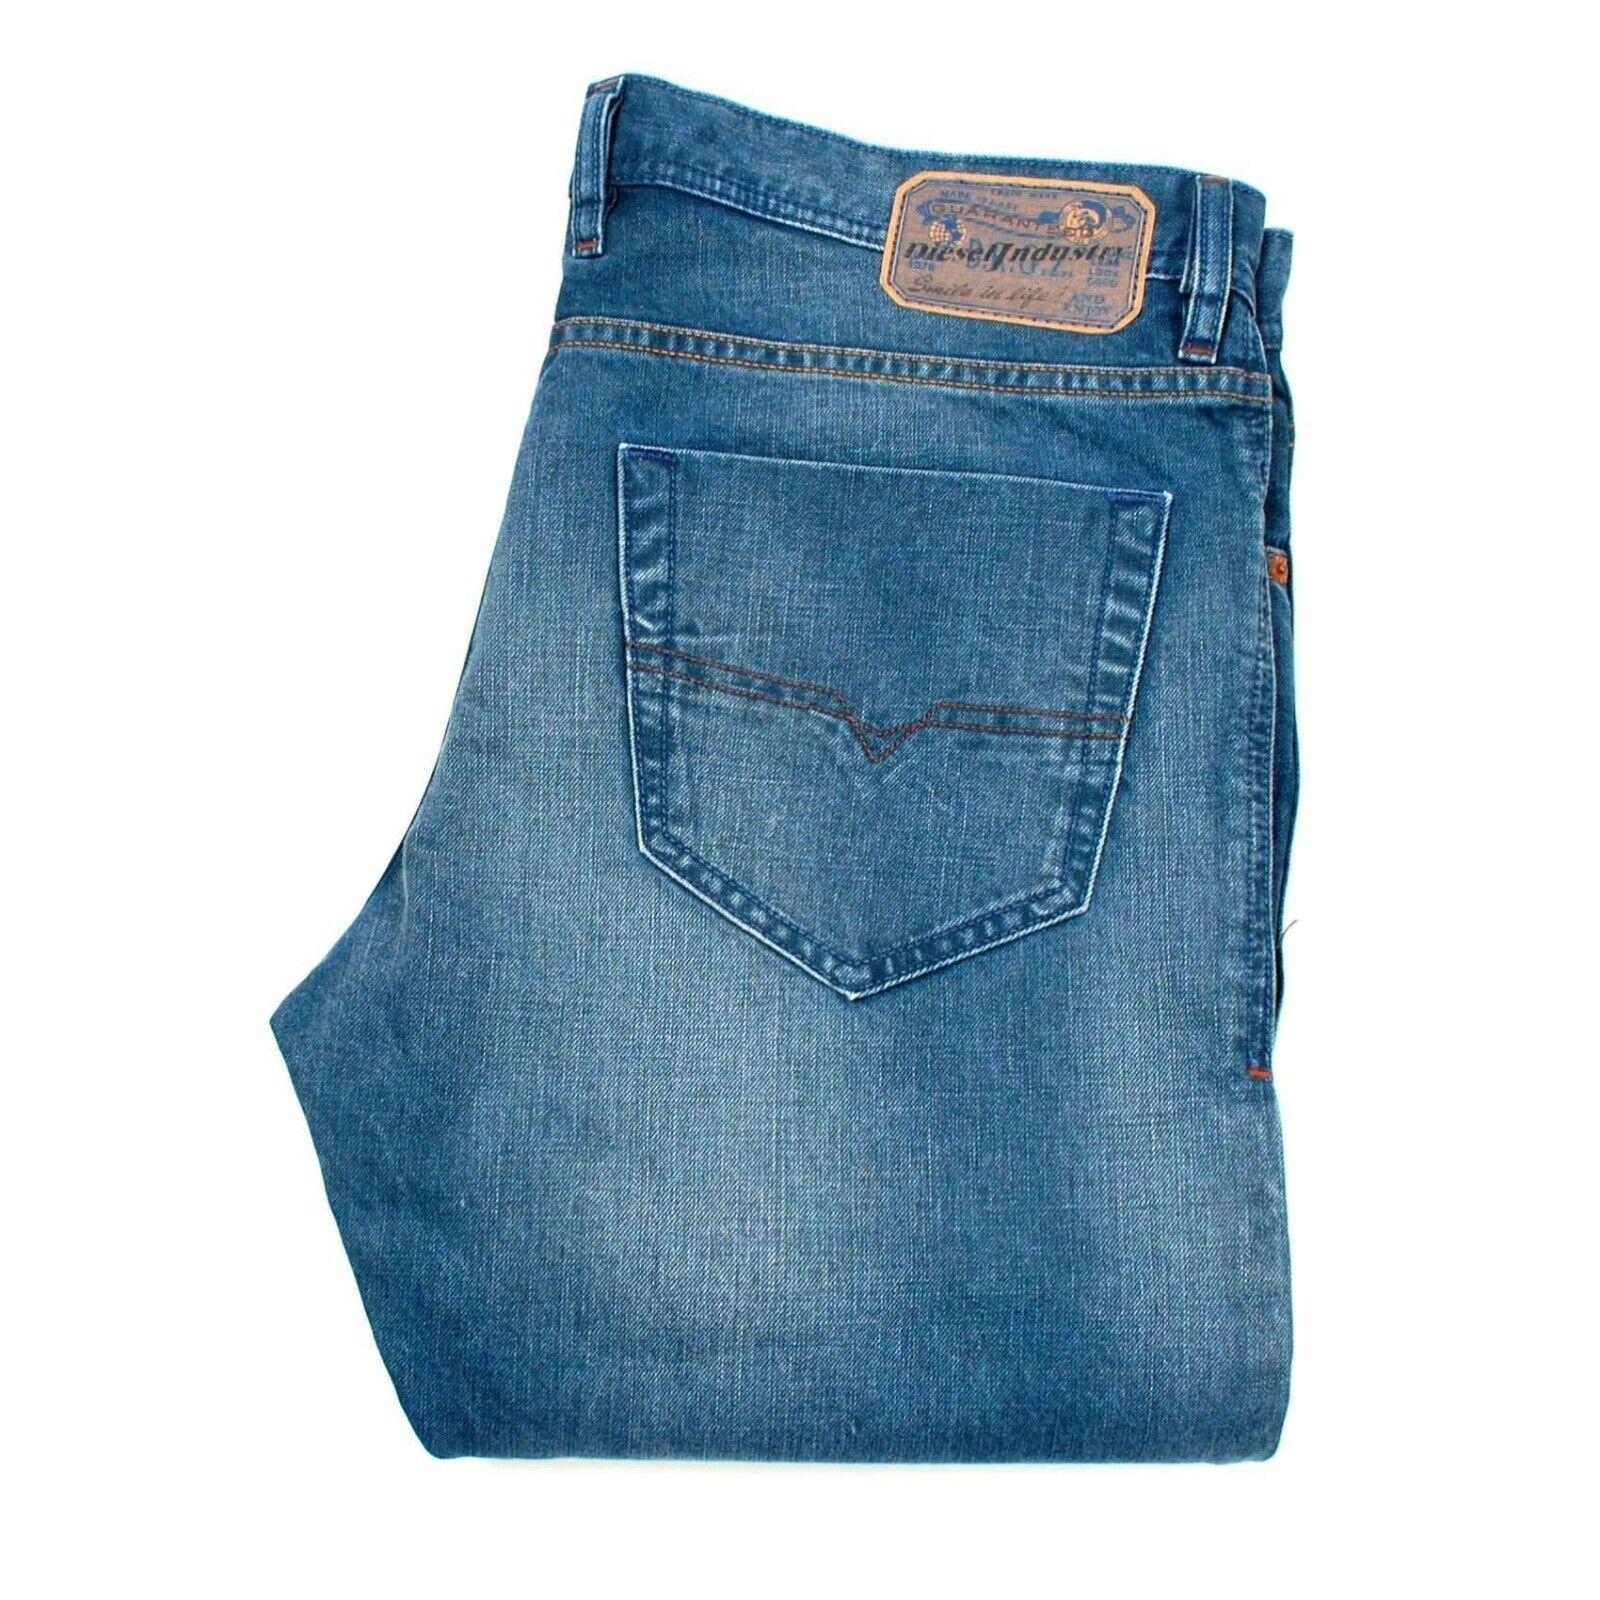 DIESEL NEW Tepphar 0RB81 Slim Fit bluee men Jeans Size 33 32